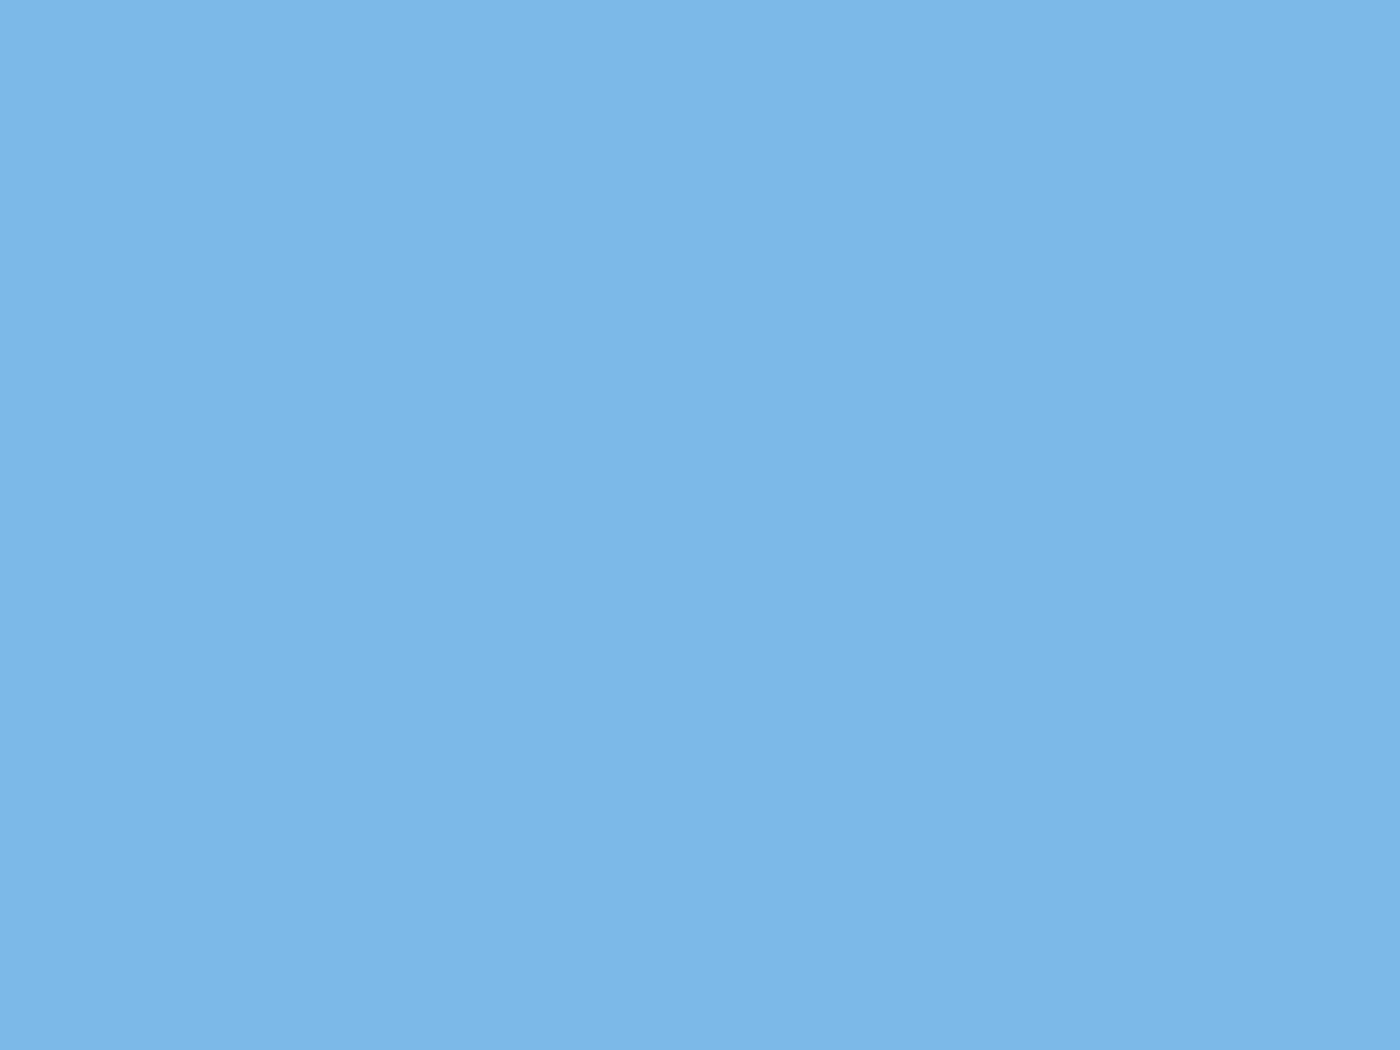 1400x1050 Aero Solid Color Background